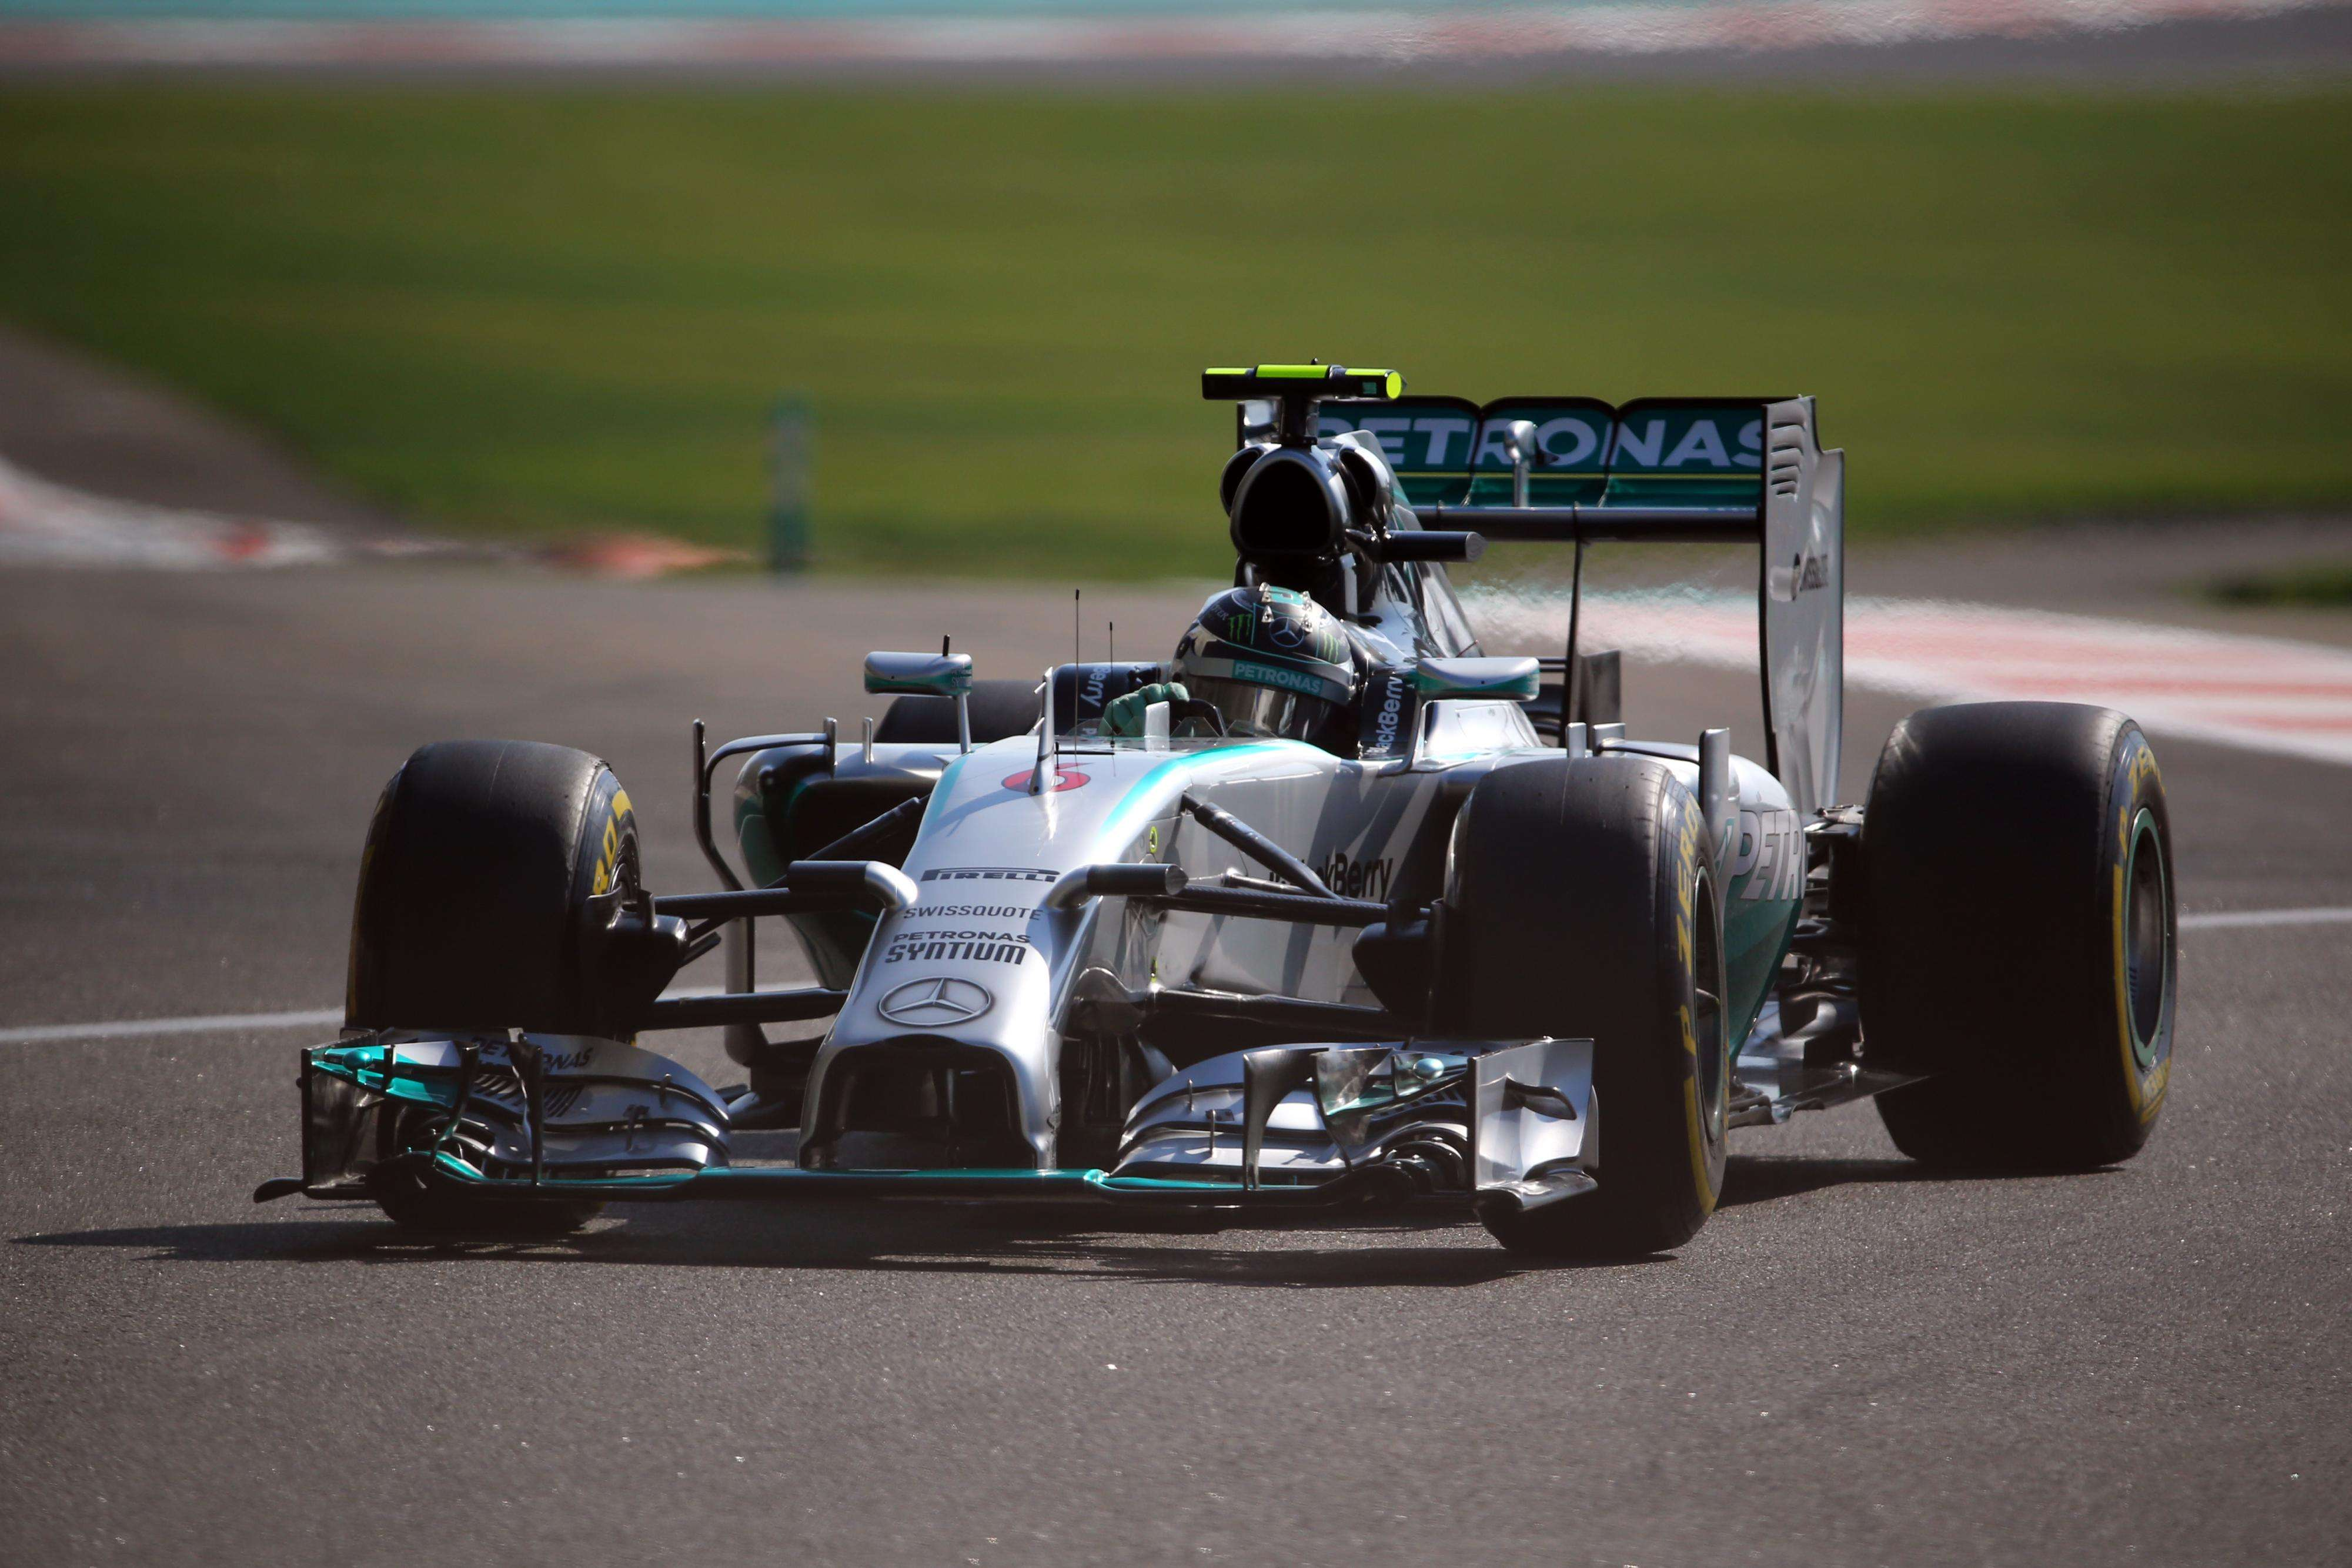 Rosberg reagiu e aumentou a pressão contra Hamilton Foto: Marwan Naamani/Reuters